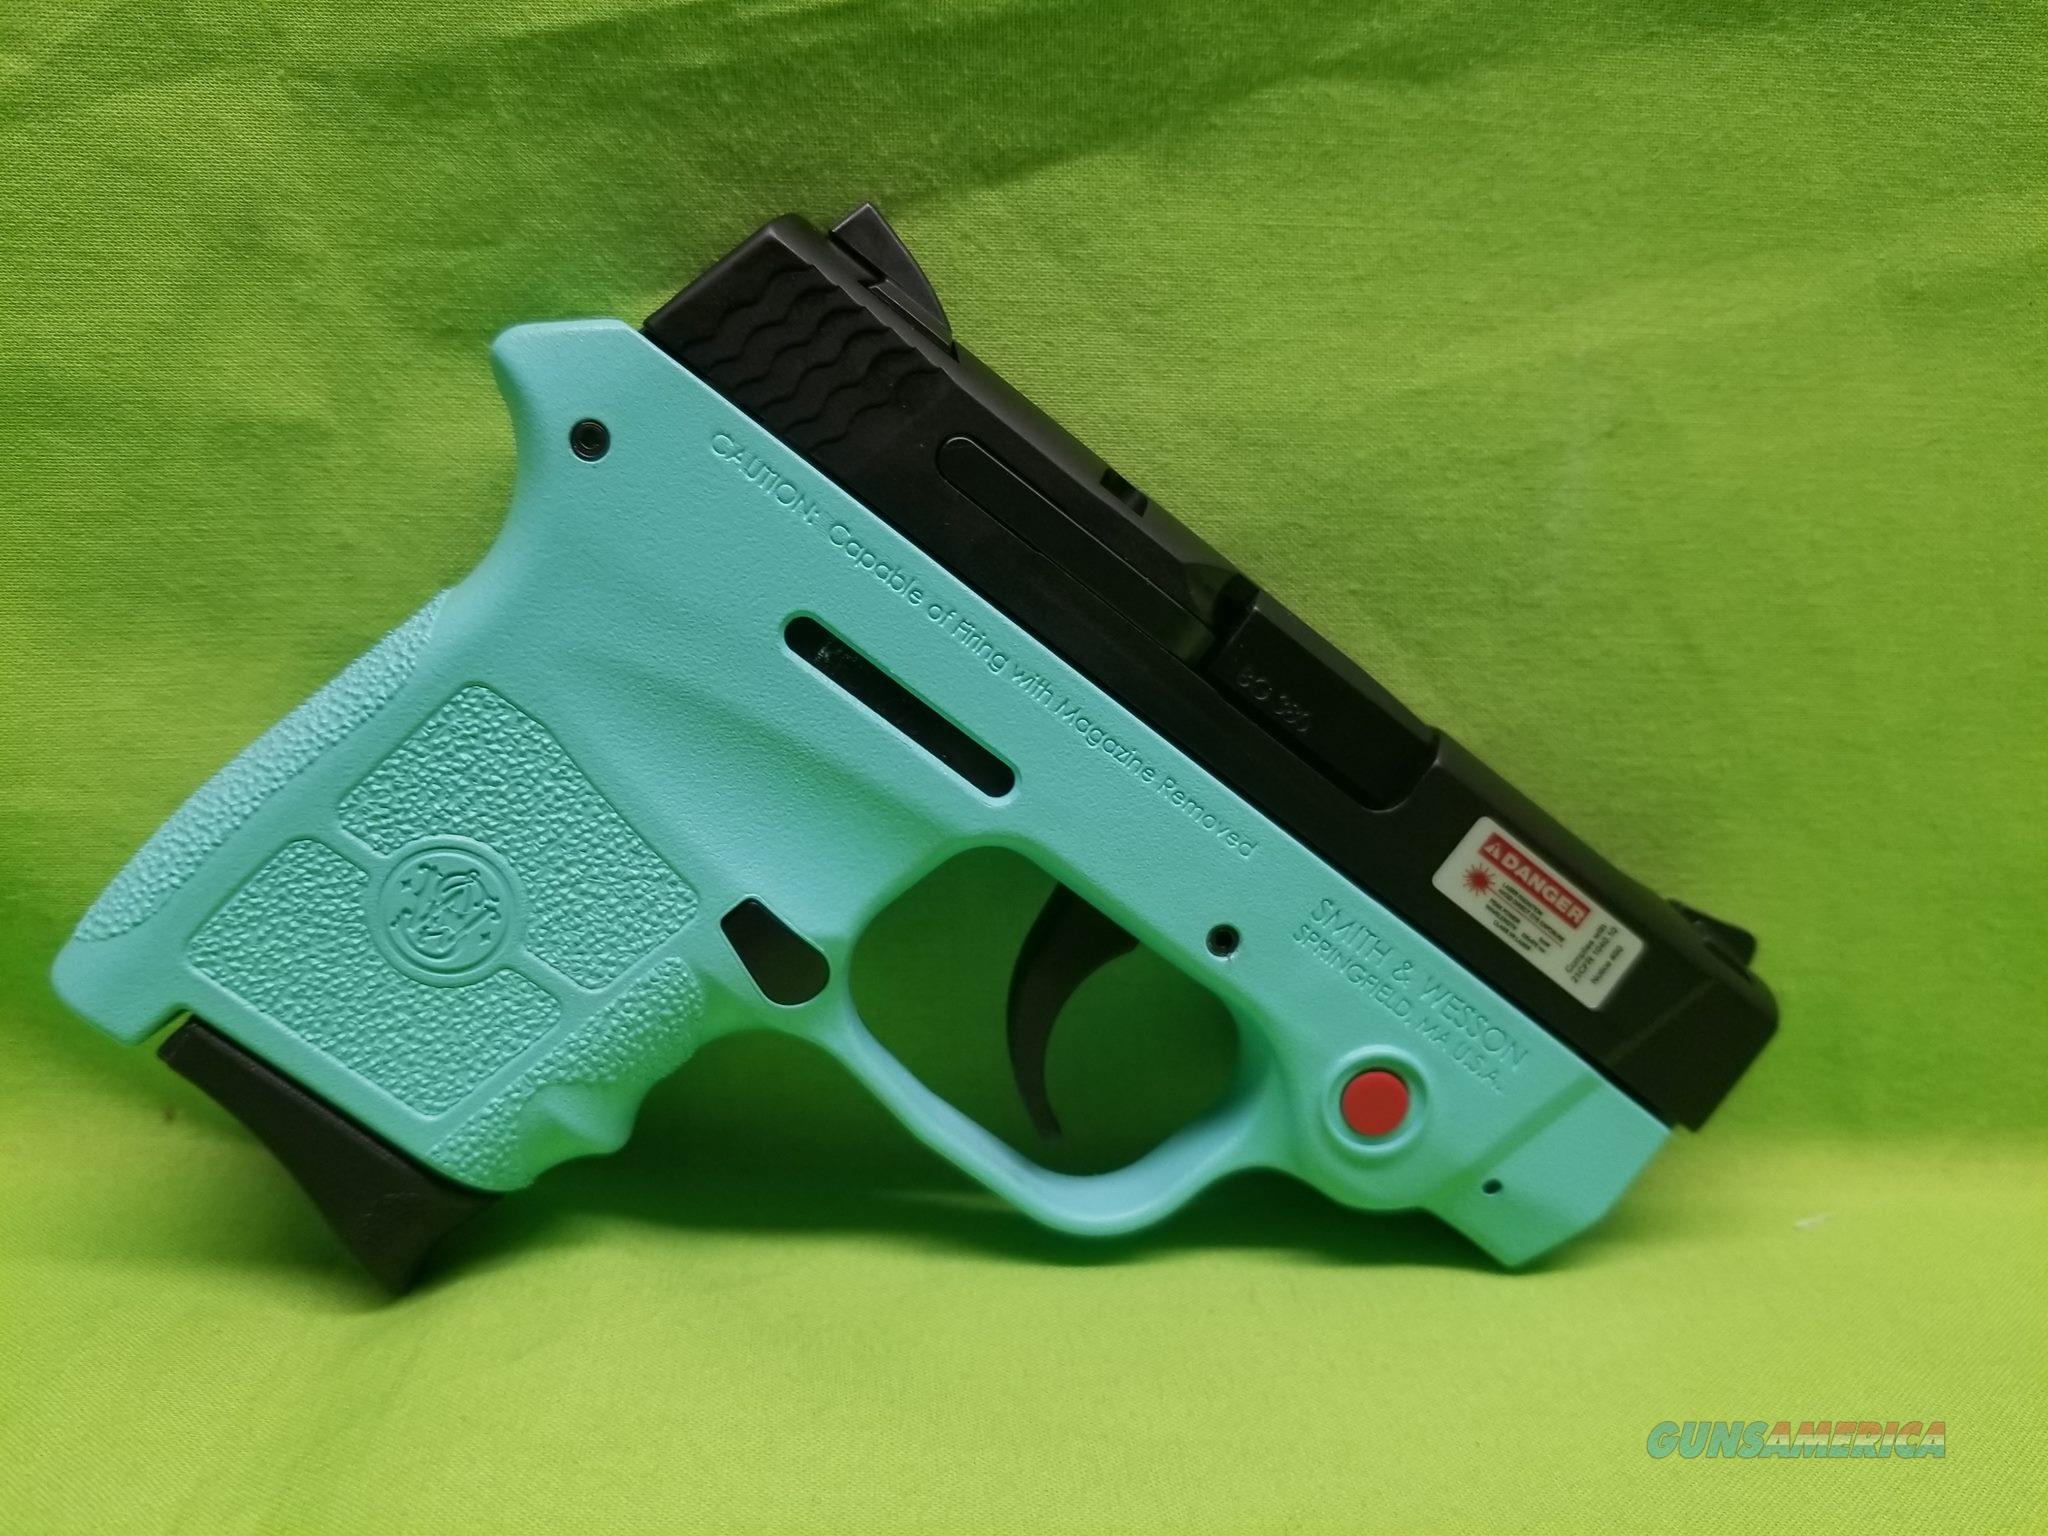 S&W M&P BODYGUARD TIFFANY 380 ACP ROBIN EGG BLUE  Guns > Pistols > Smith & Wesson Pistols - Autos > Polymer Frame